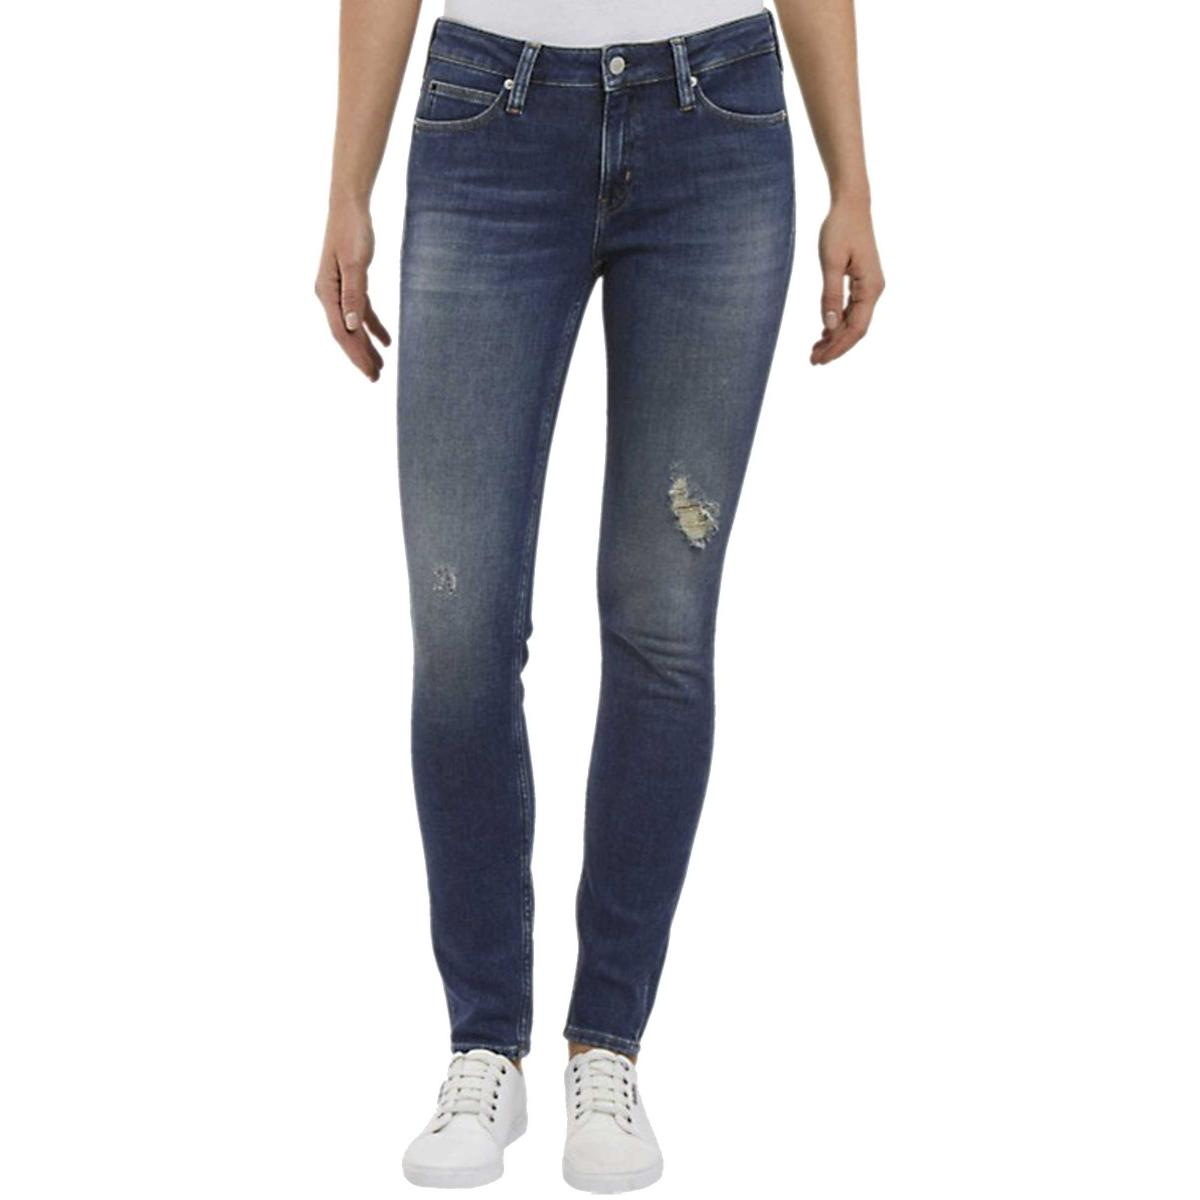 Jeans Calvin Klein Jeans CKJ 011 MID RISE SKI da donna rif. J20J209427